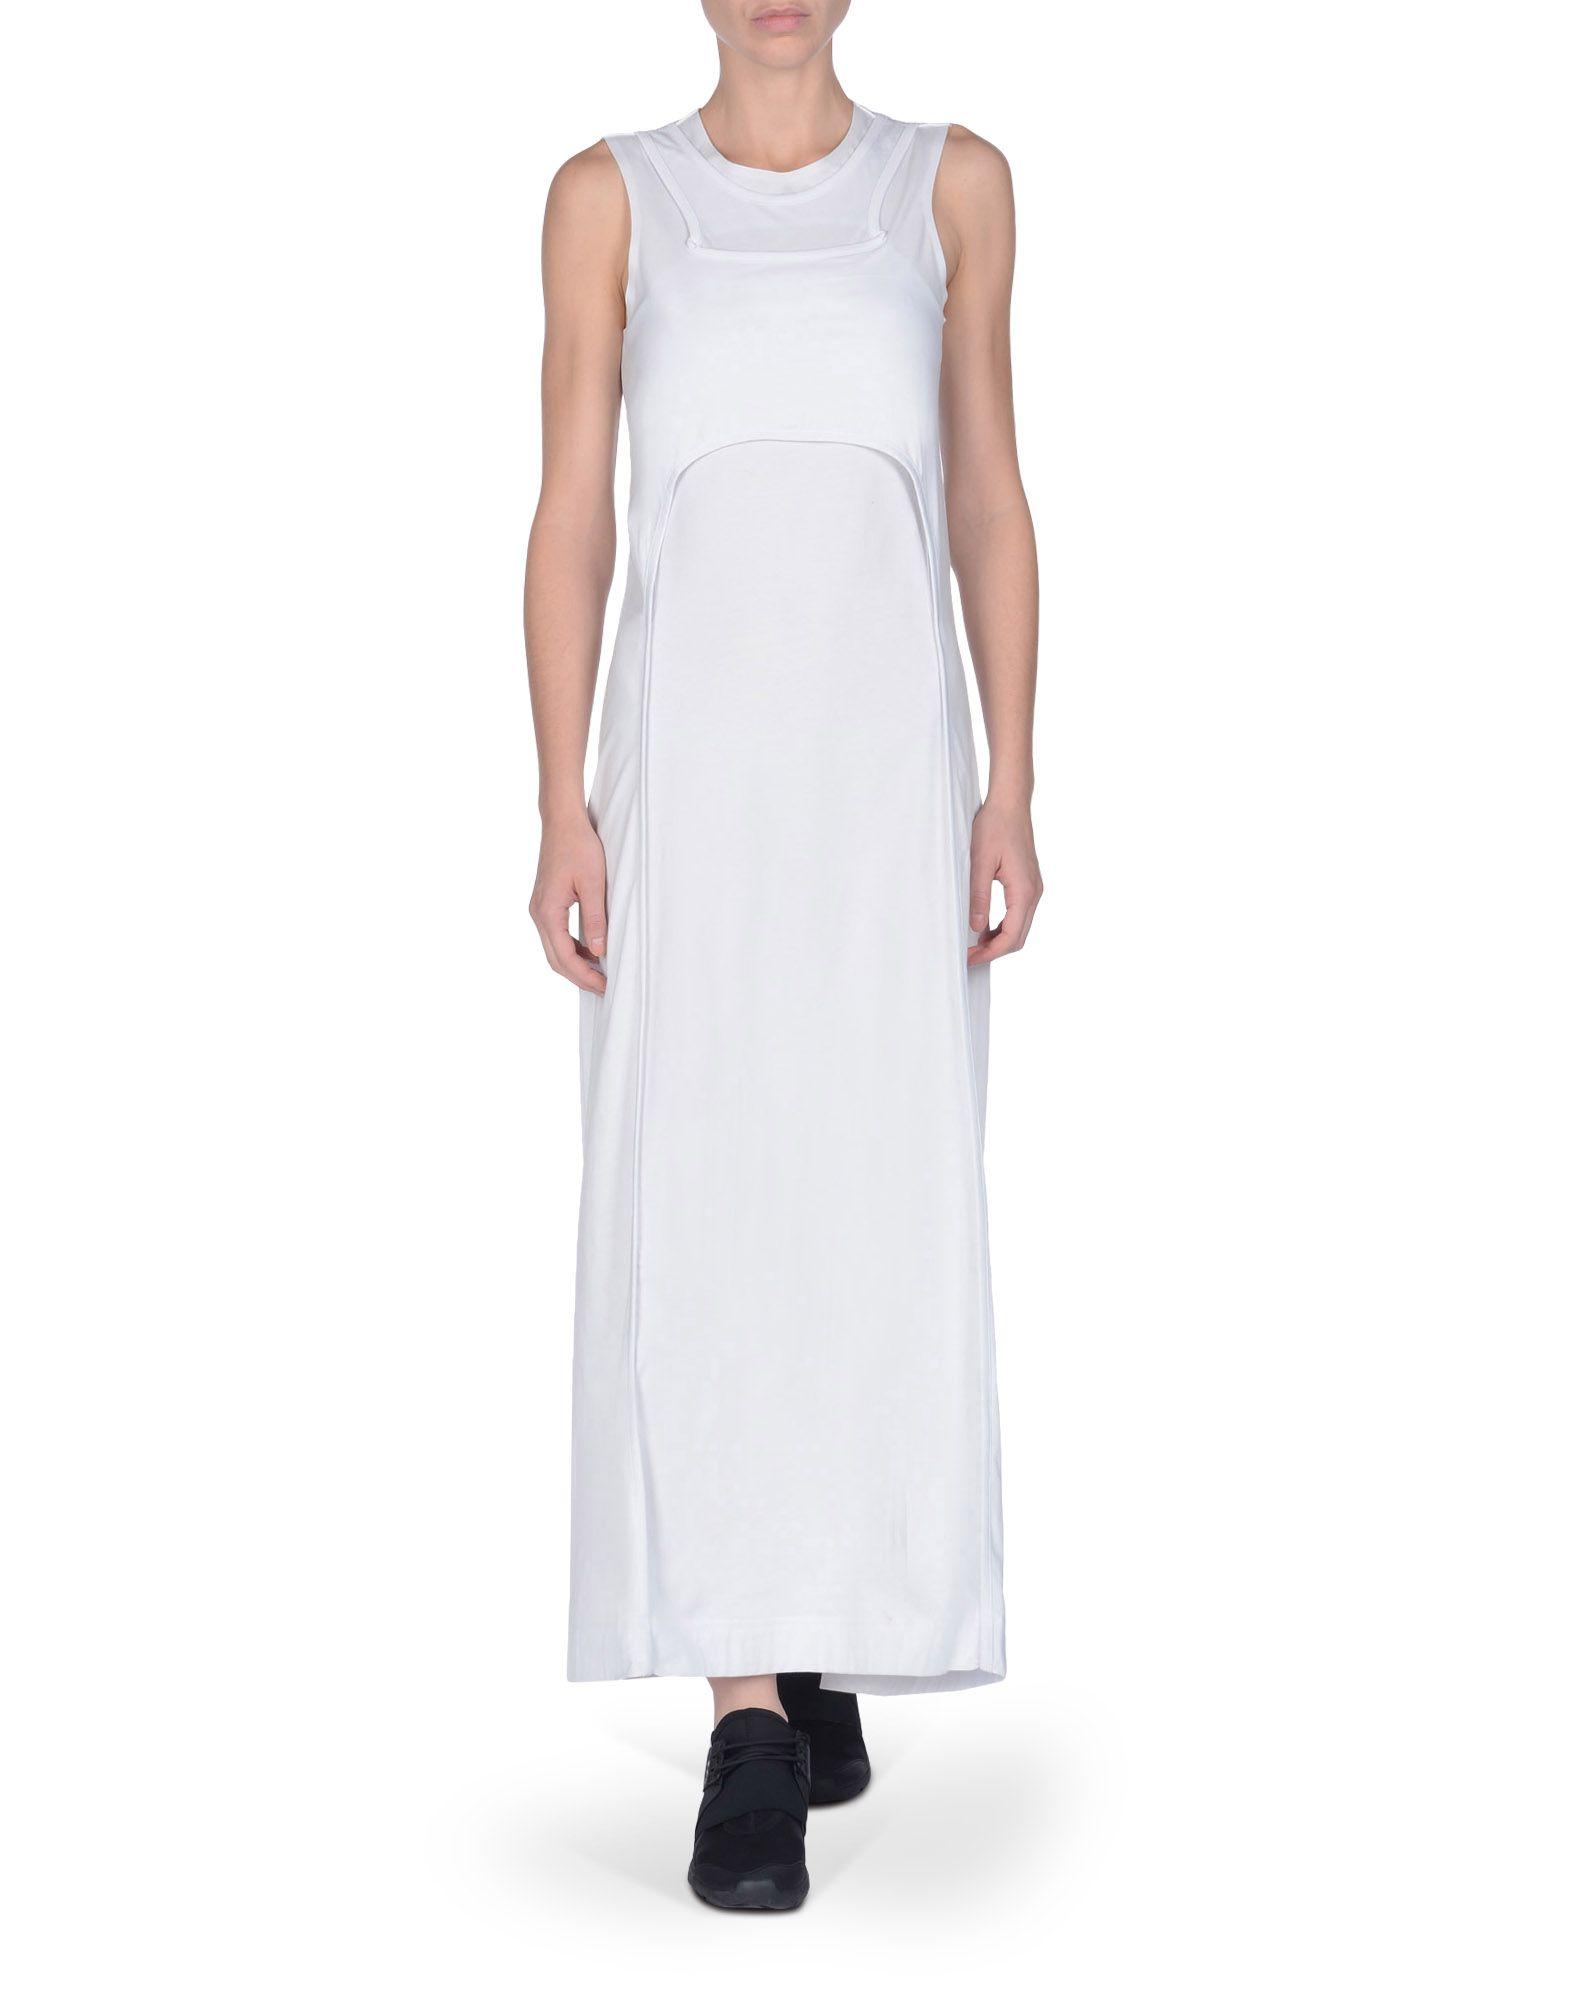 Y-3 JERSEY DRESS DRESSES & SKIRTS woman Y-3 adidas